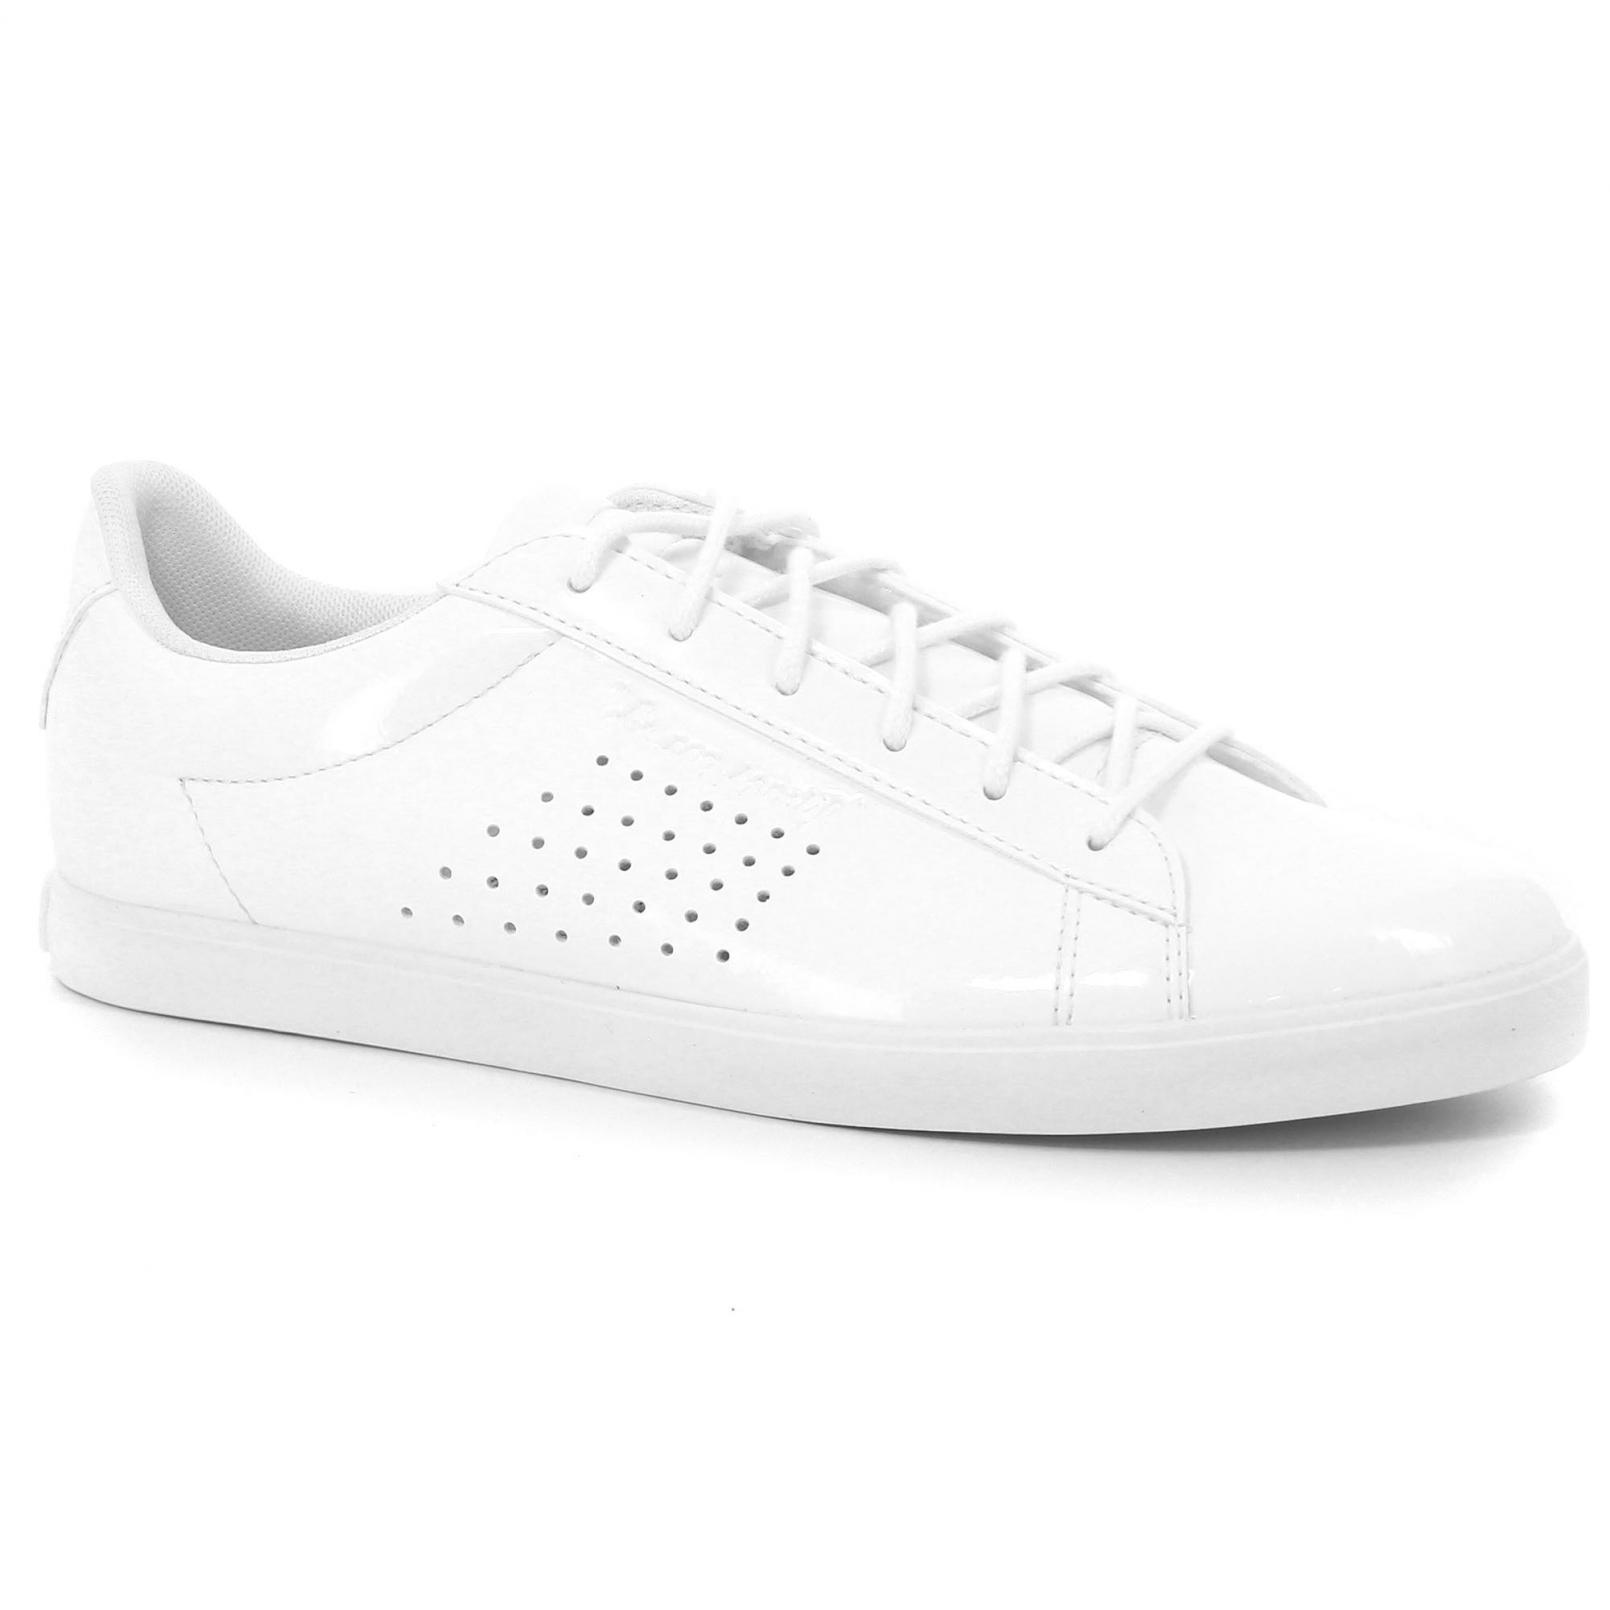 Shoes – Le Coq Sportif Agate Lo Patent White